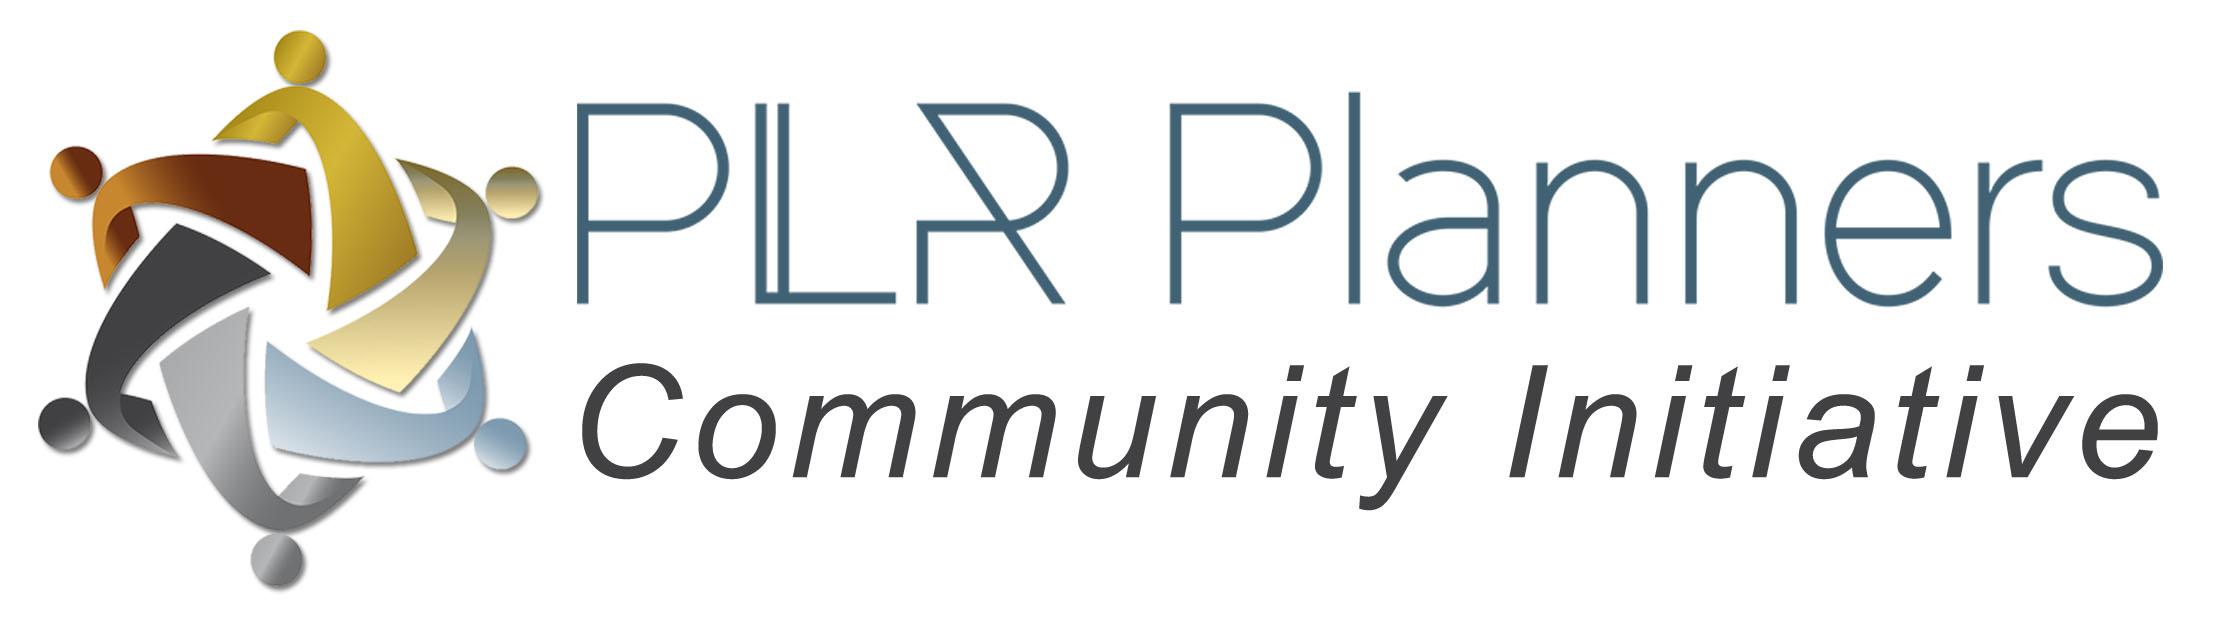 PLR Planner's Community Initiative